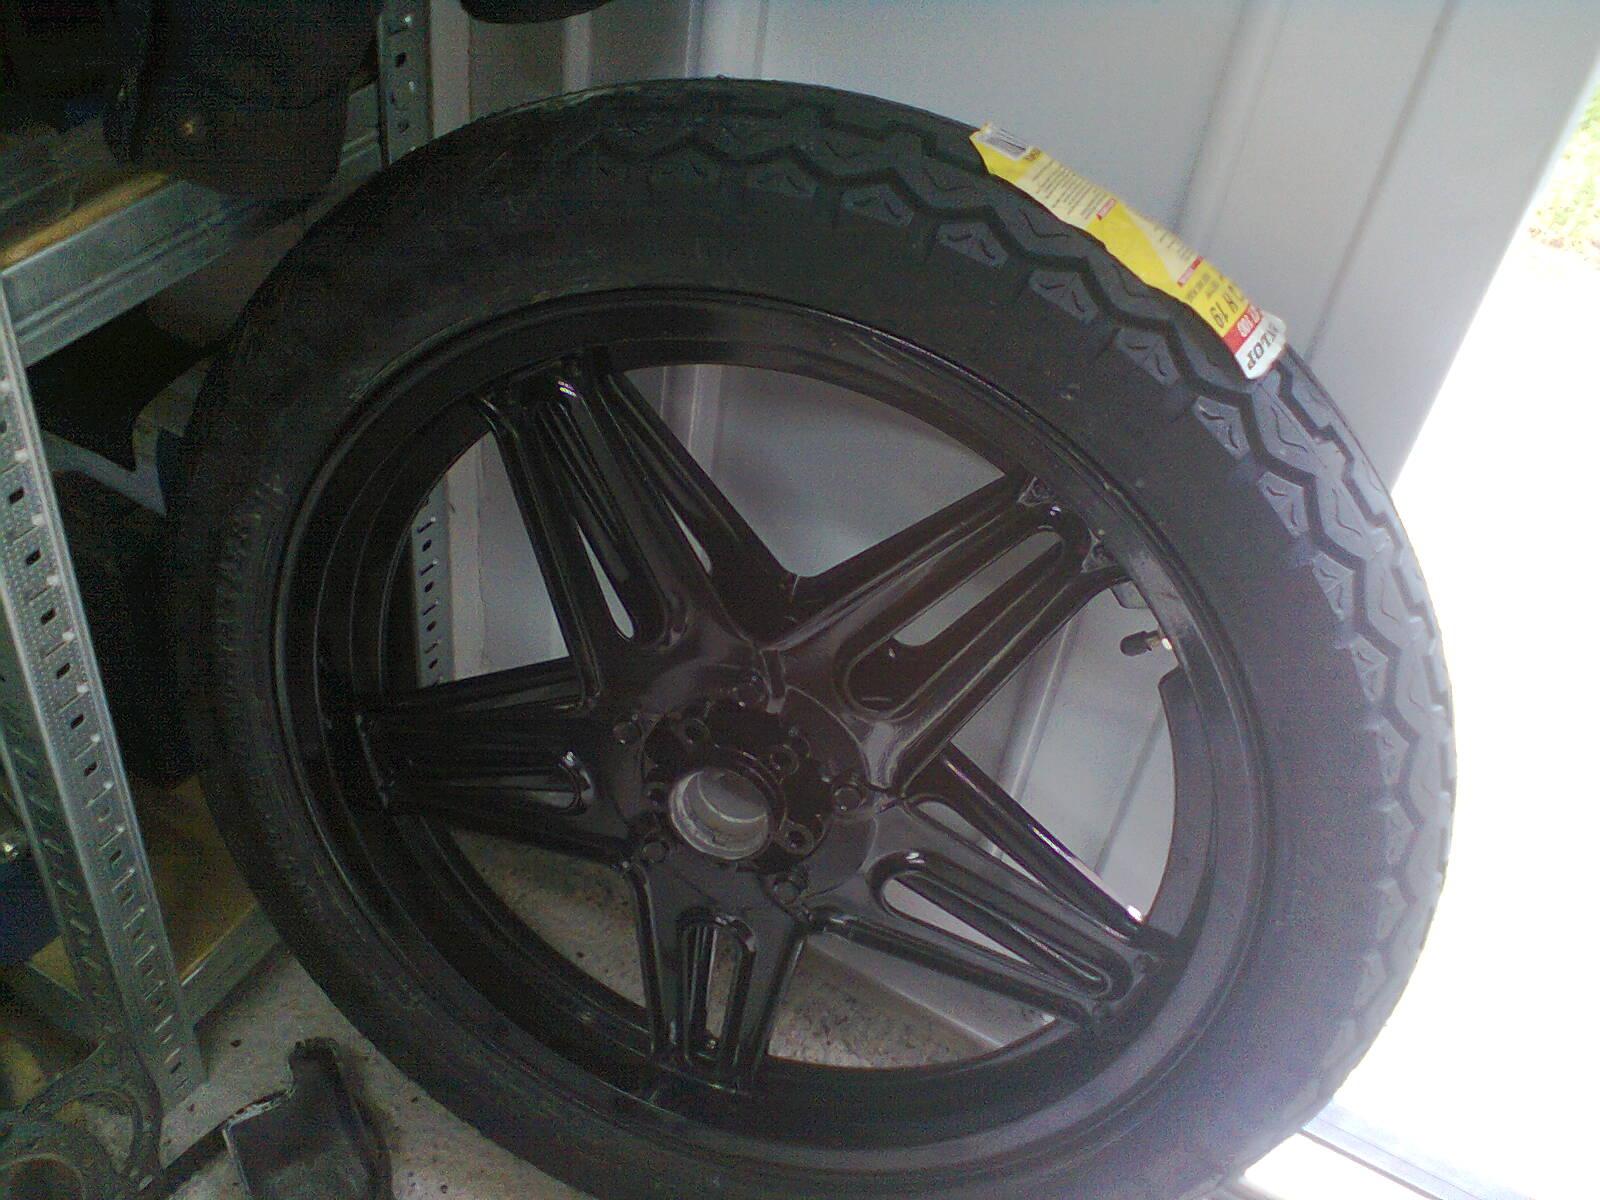 GL1100 progress – wheels and tires ready